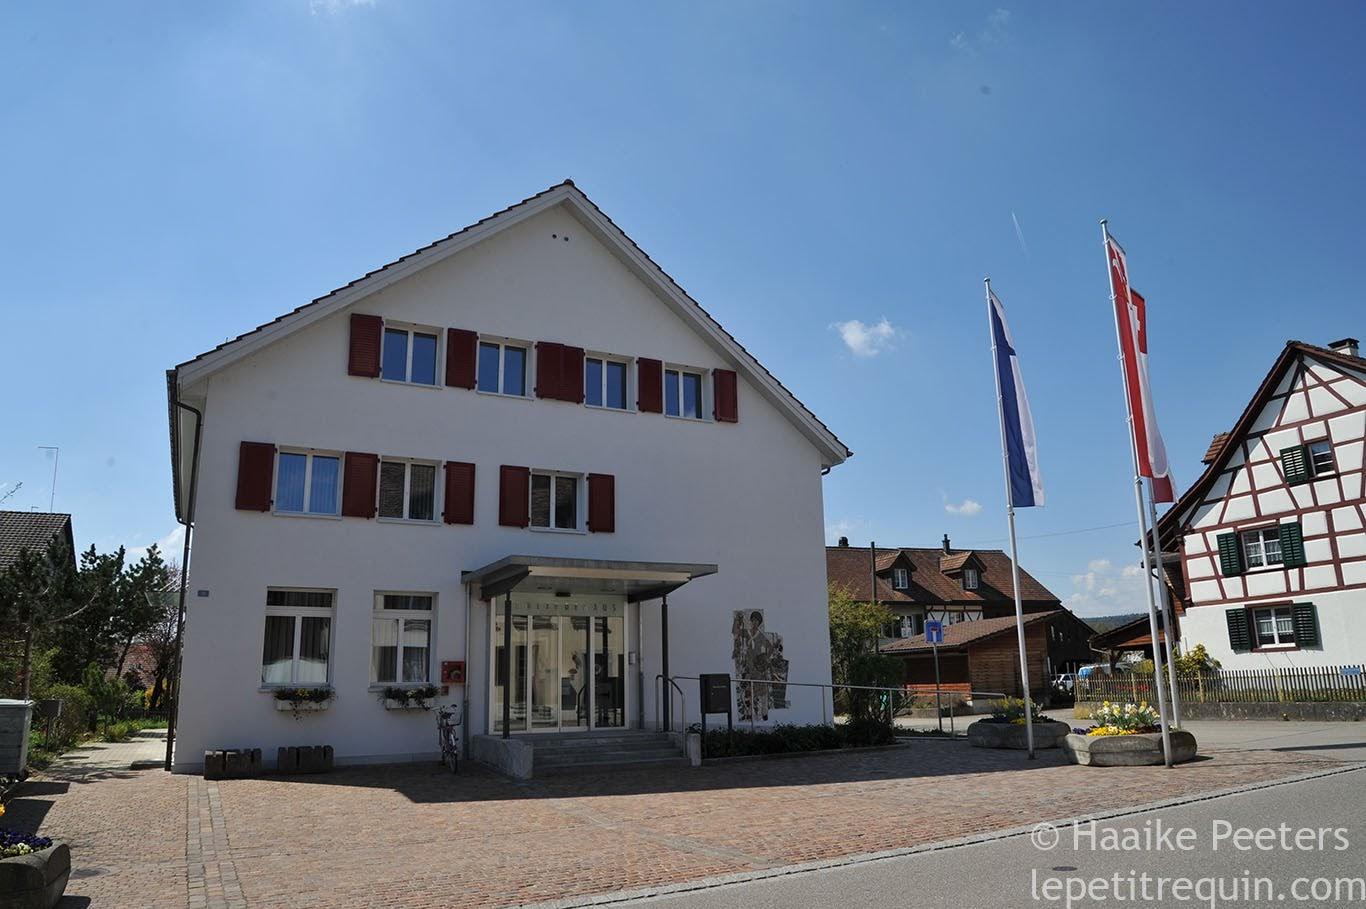 Gemeindehaus Dachsen (Le petit requin)